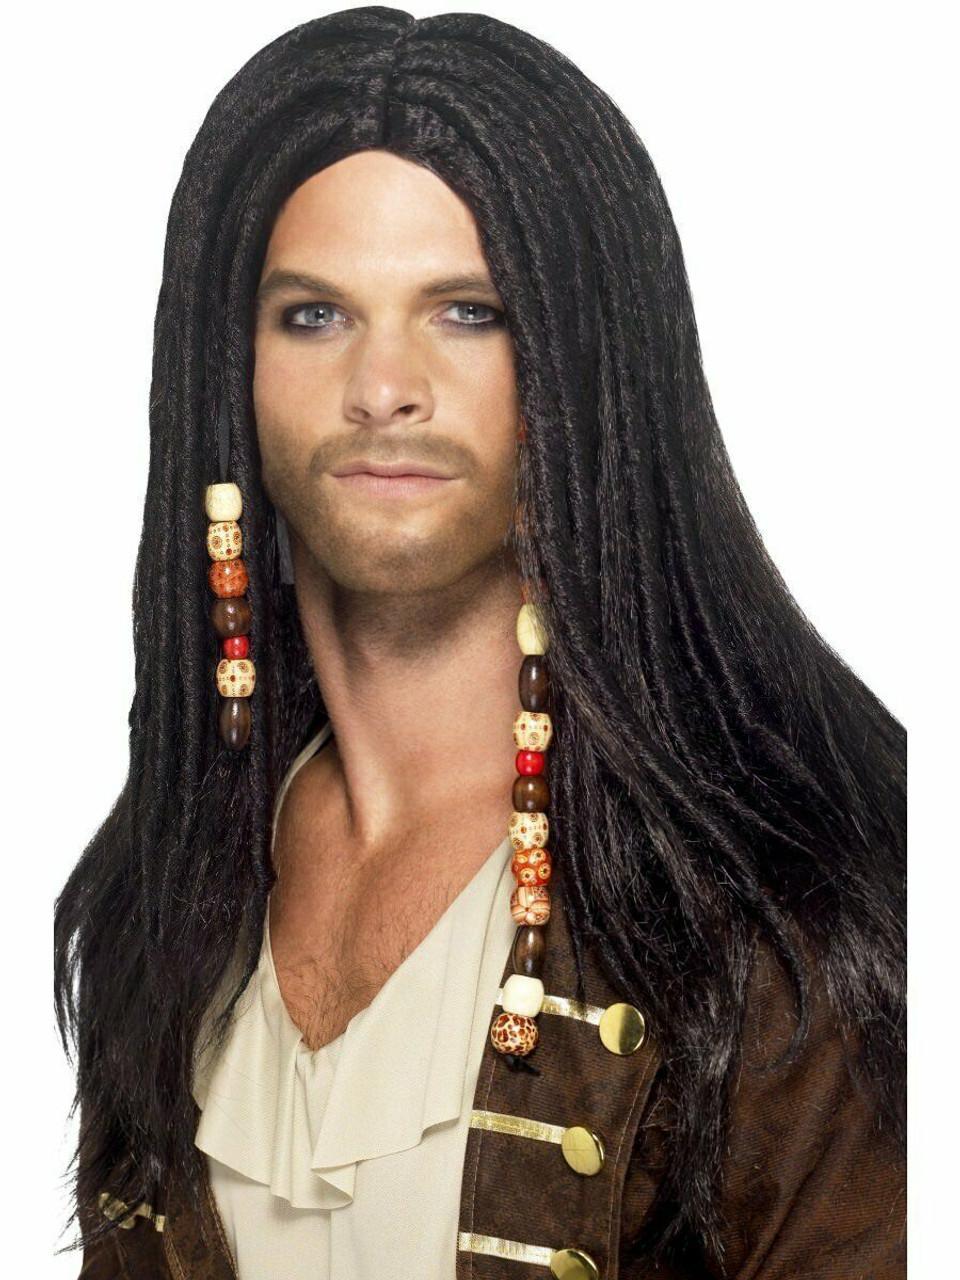 Smiffys Pirate Dreadlocks Beads Wig Adult Halloween Costume Accessory 43286